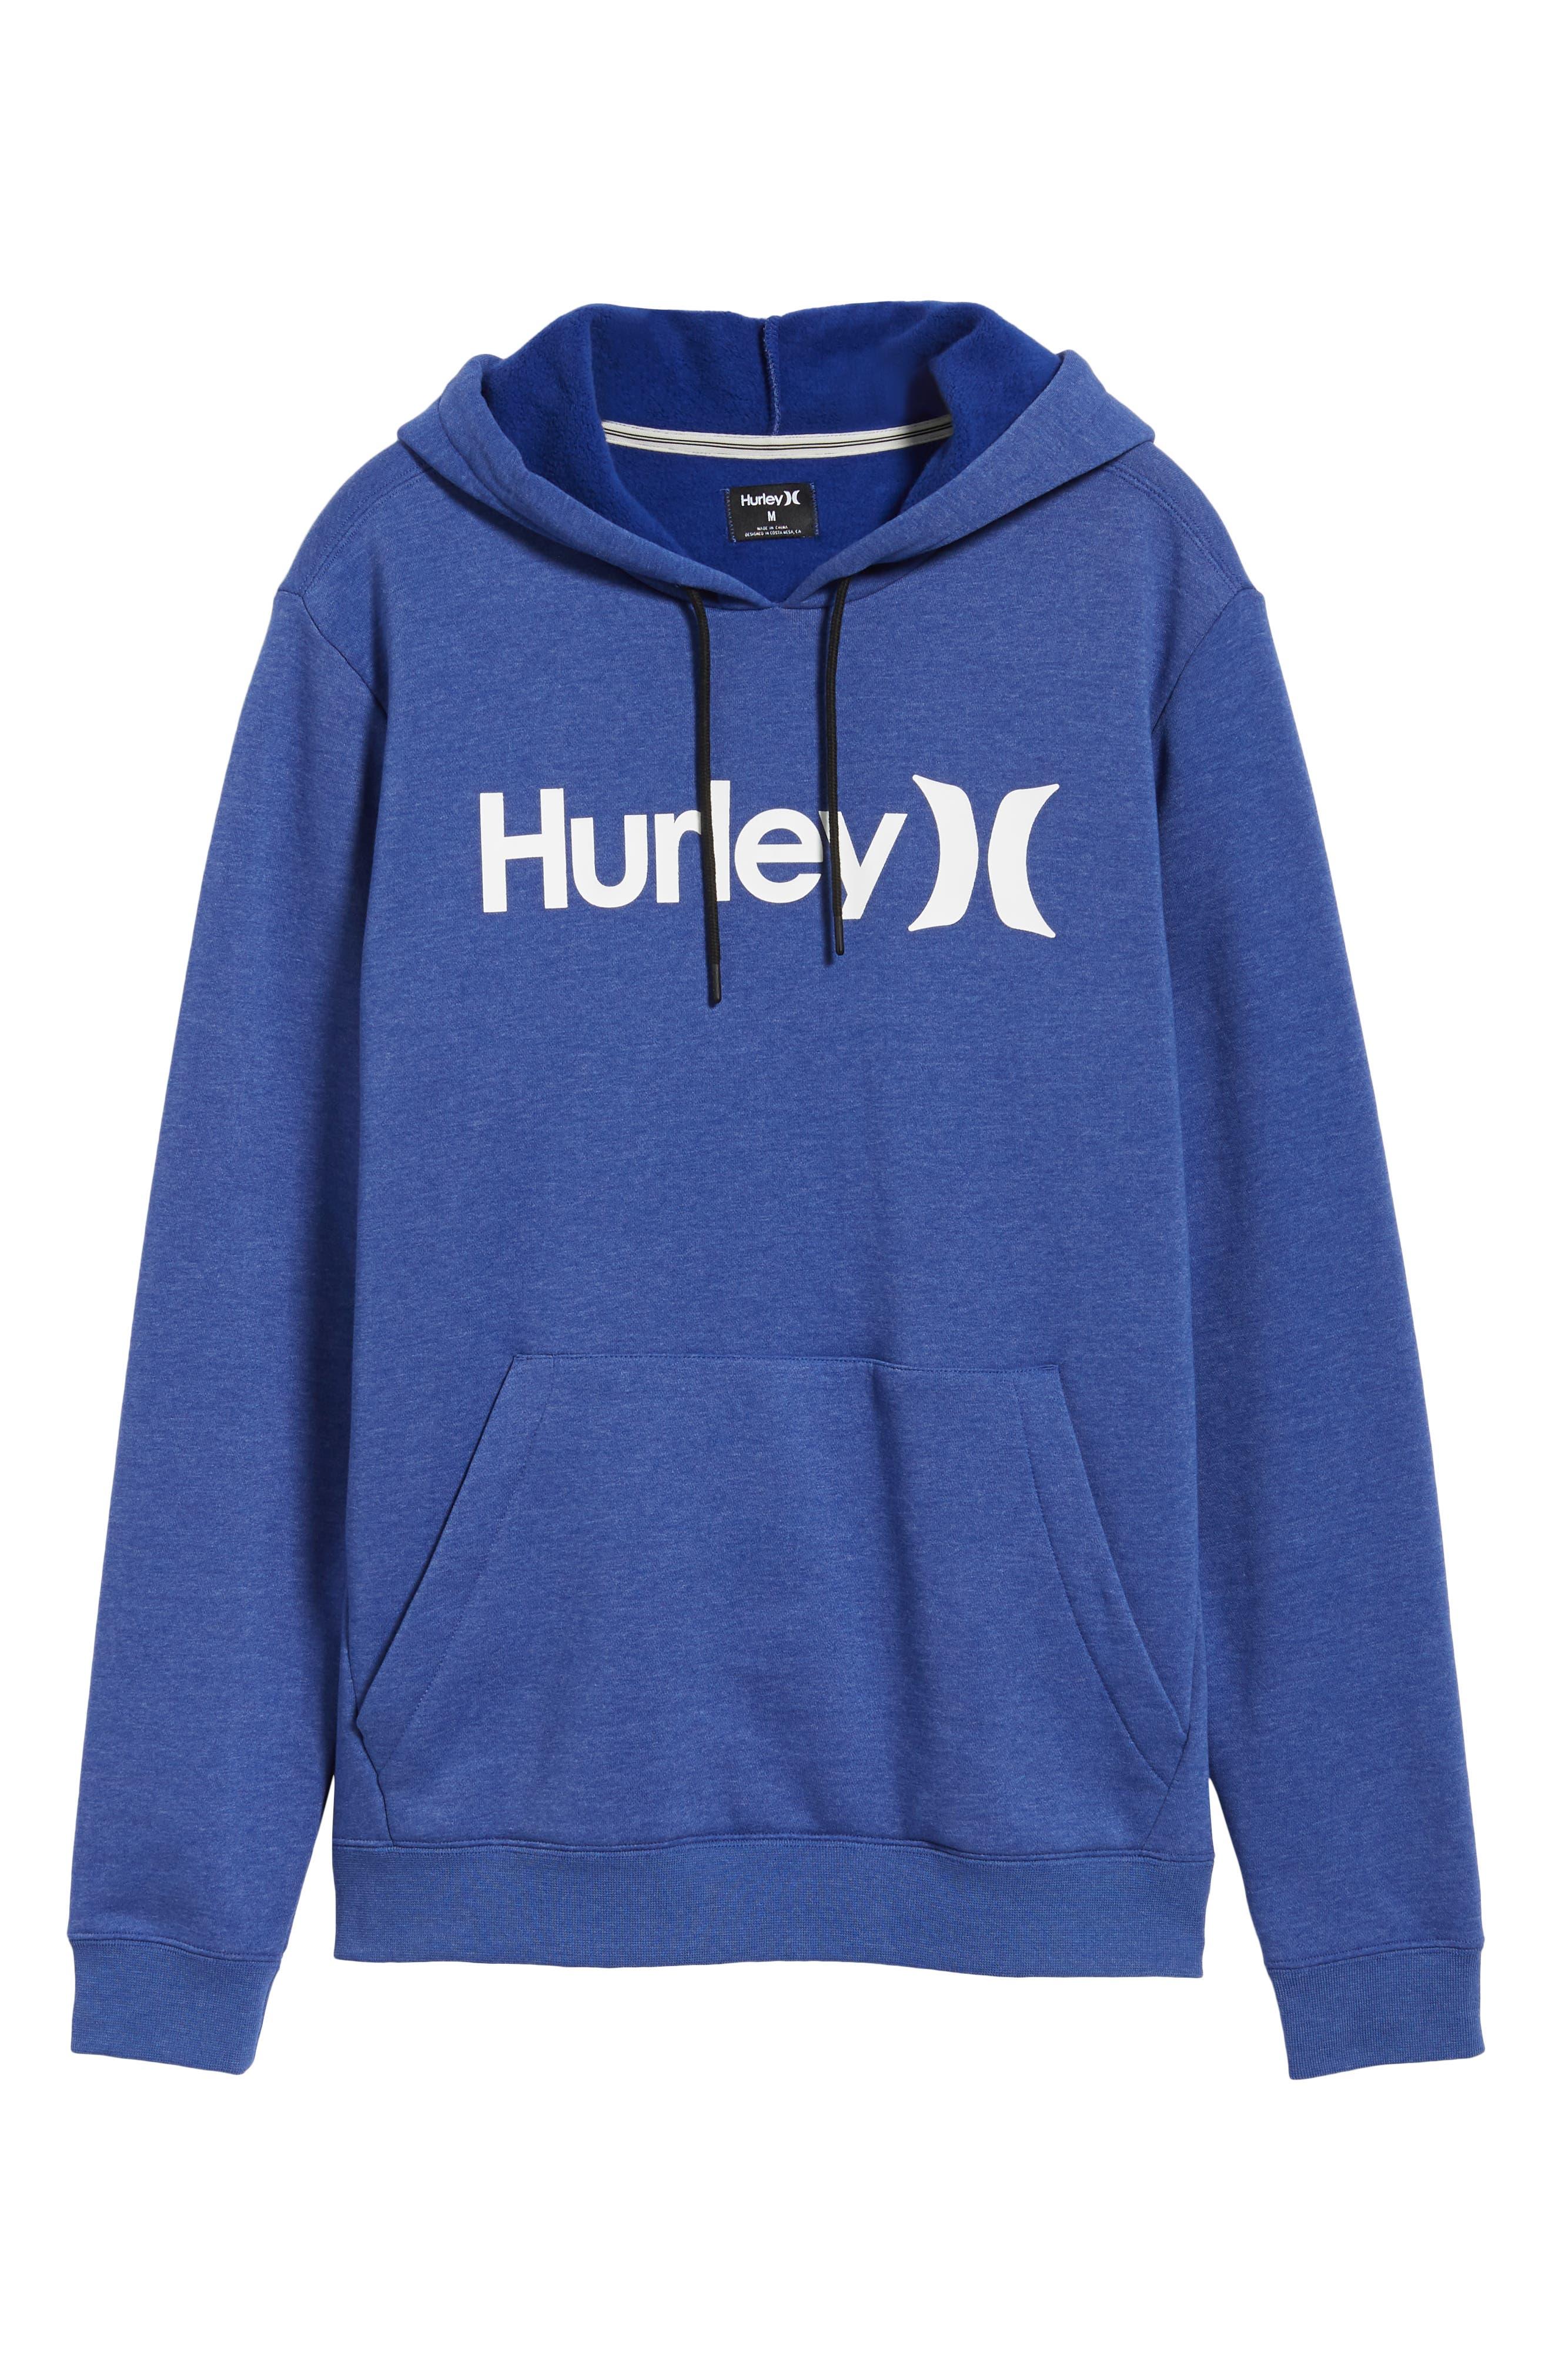 Surf Check Hoodie Sweatshirt,                             Alternate thumbnail 6, color,                             DEEP ROYAL HEATHER/ WHITE